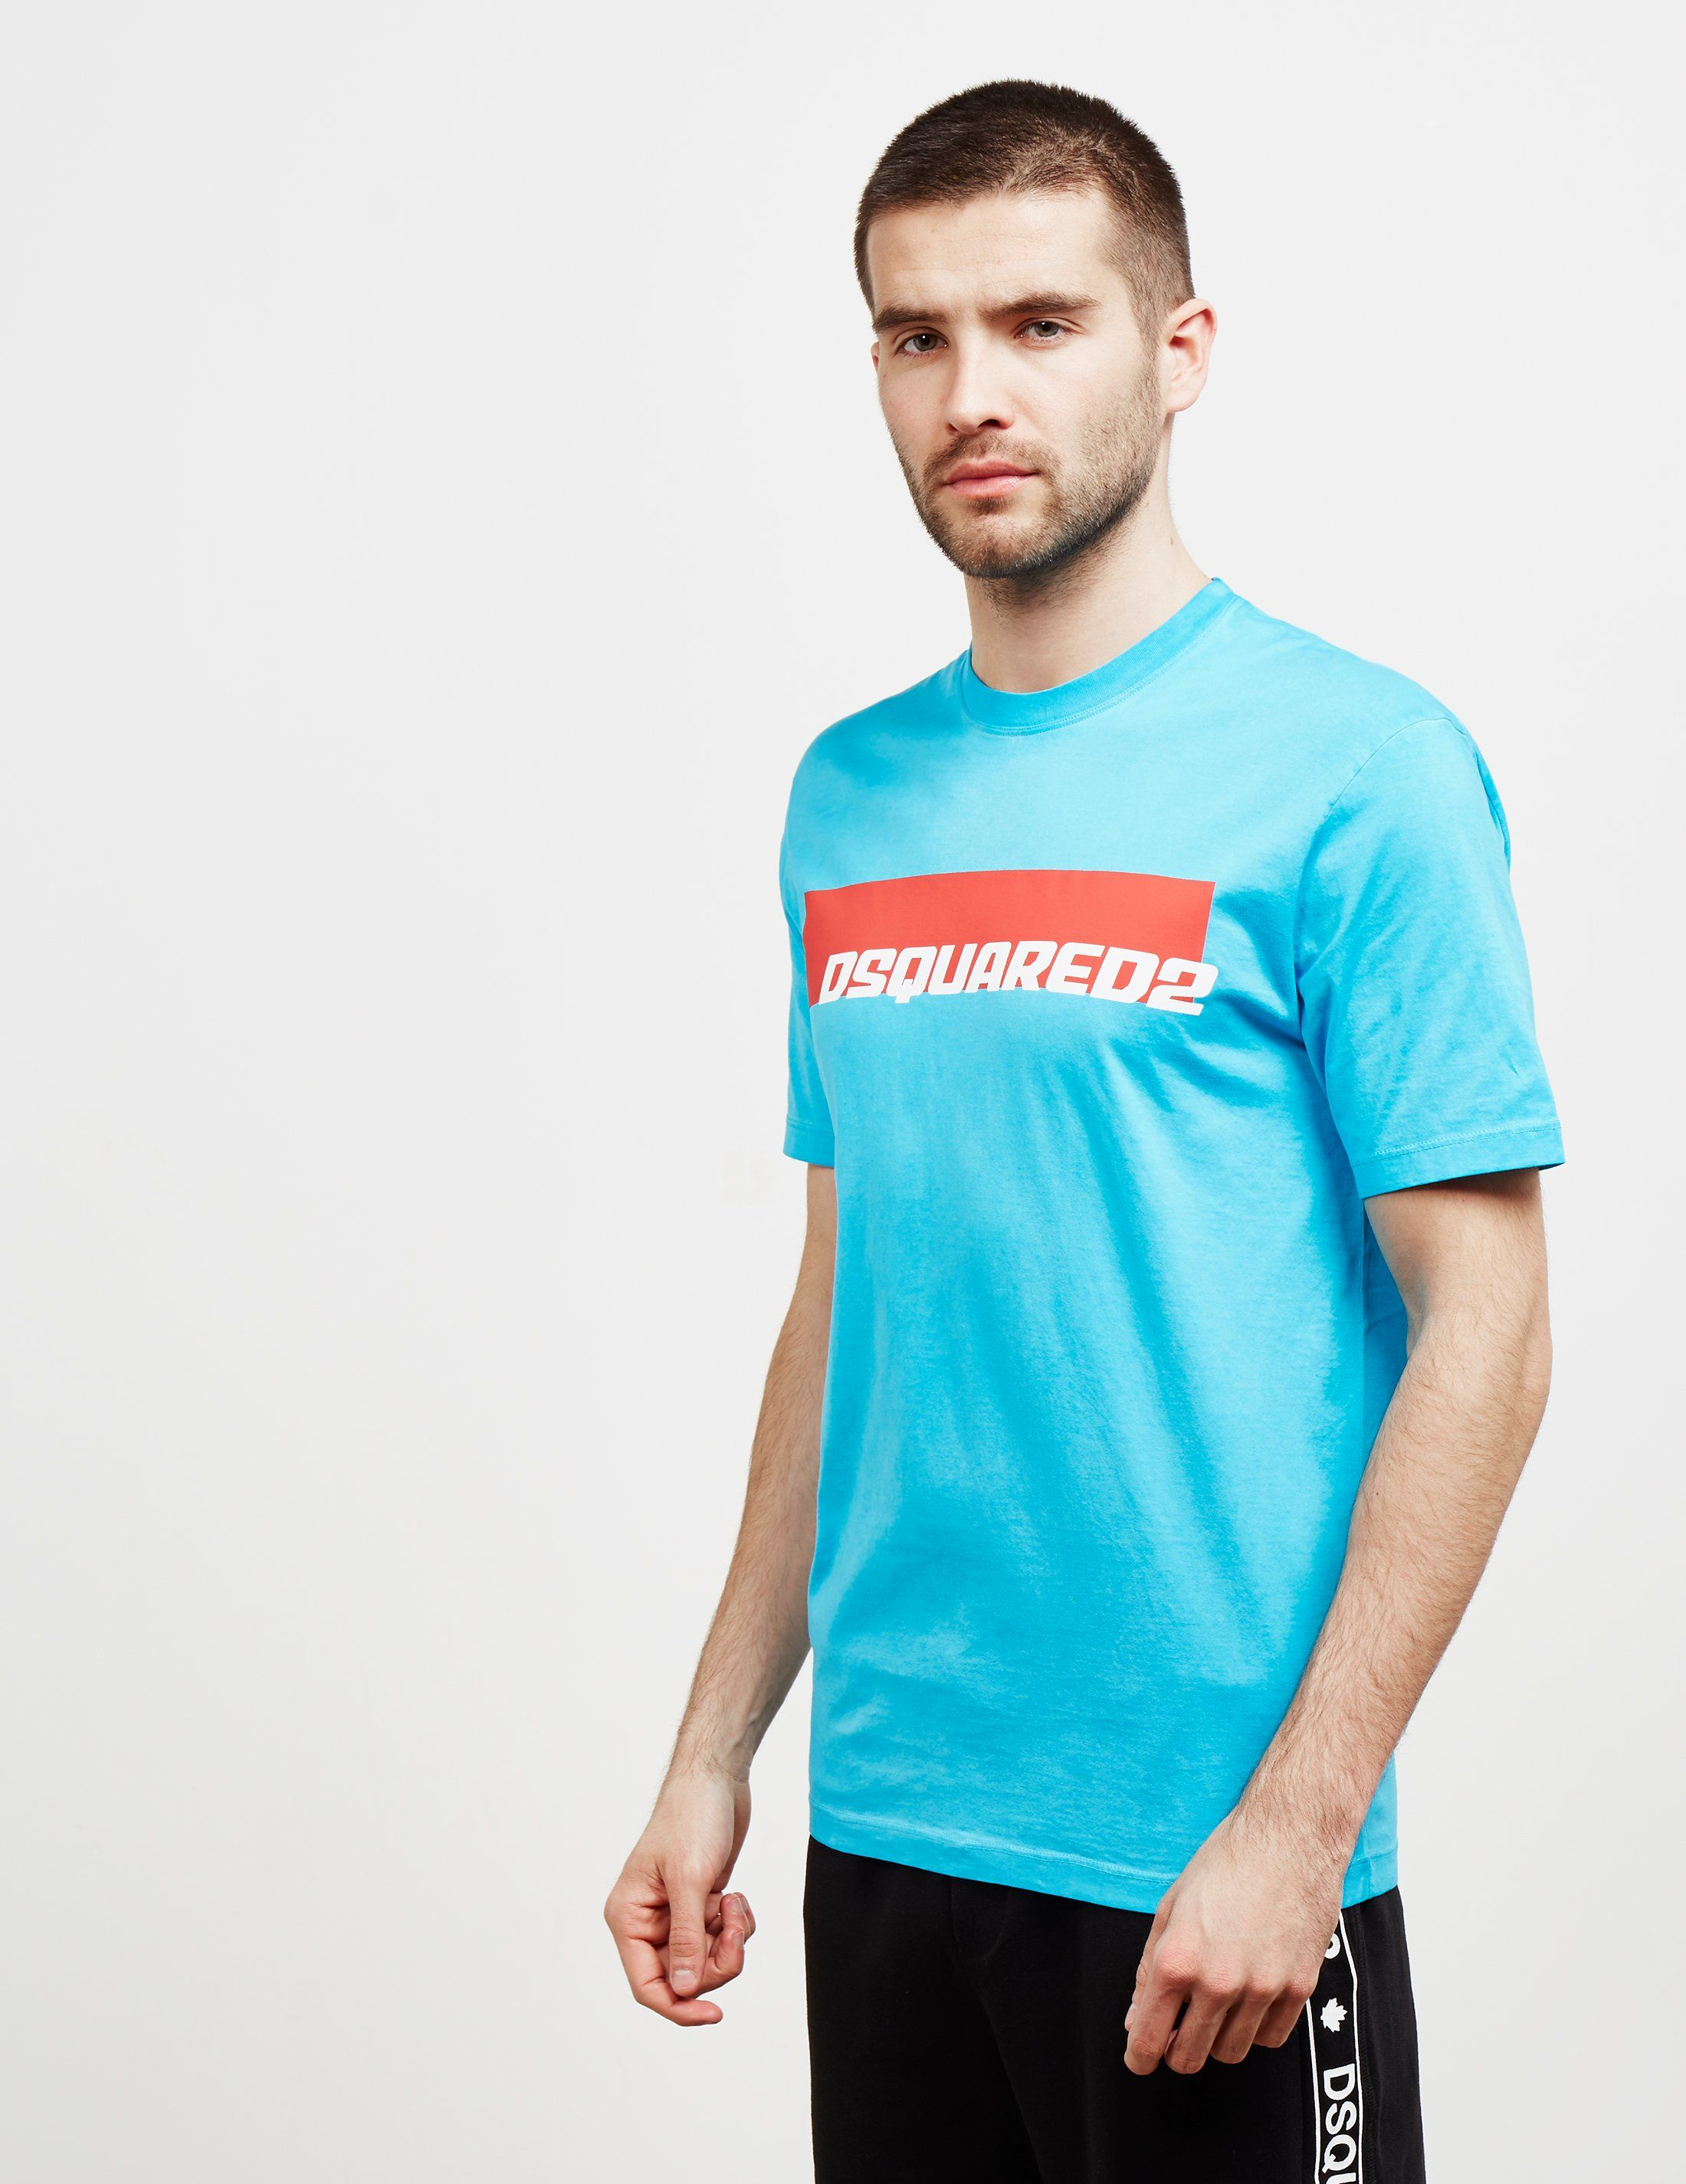 Dsquared2 Biker Box Short Sleeve T-Shirt